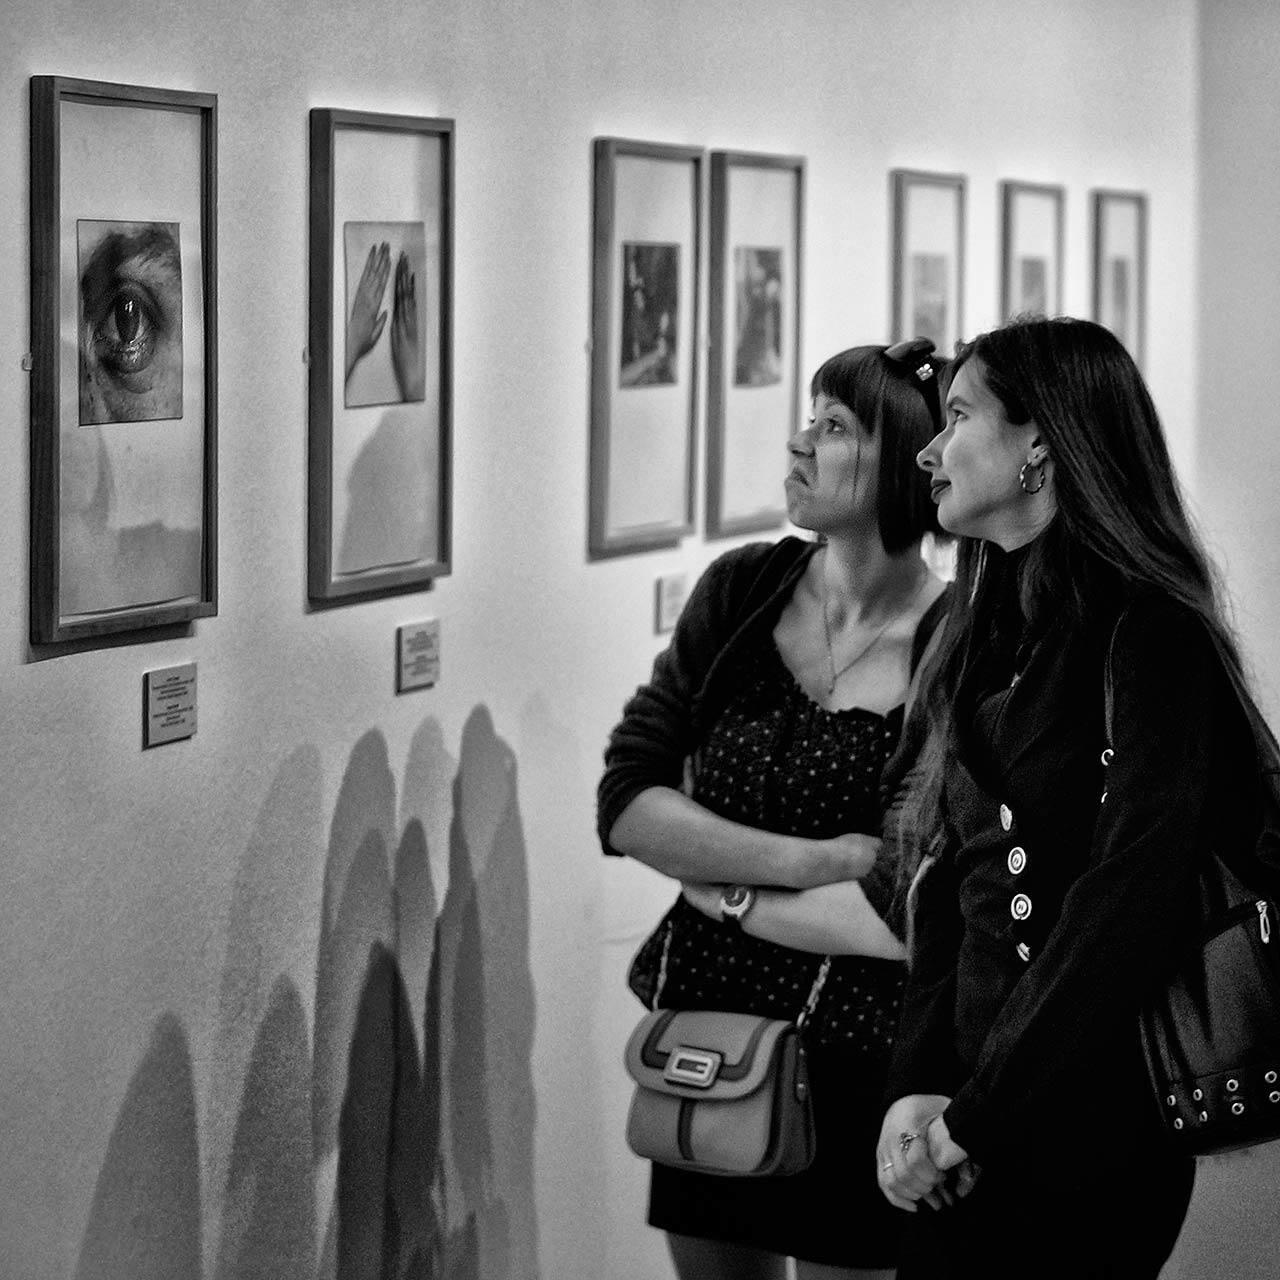 Мультимедиа Арт Музей, Москва. Фотограф Борис Назаренко